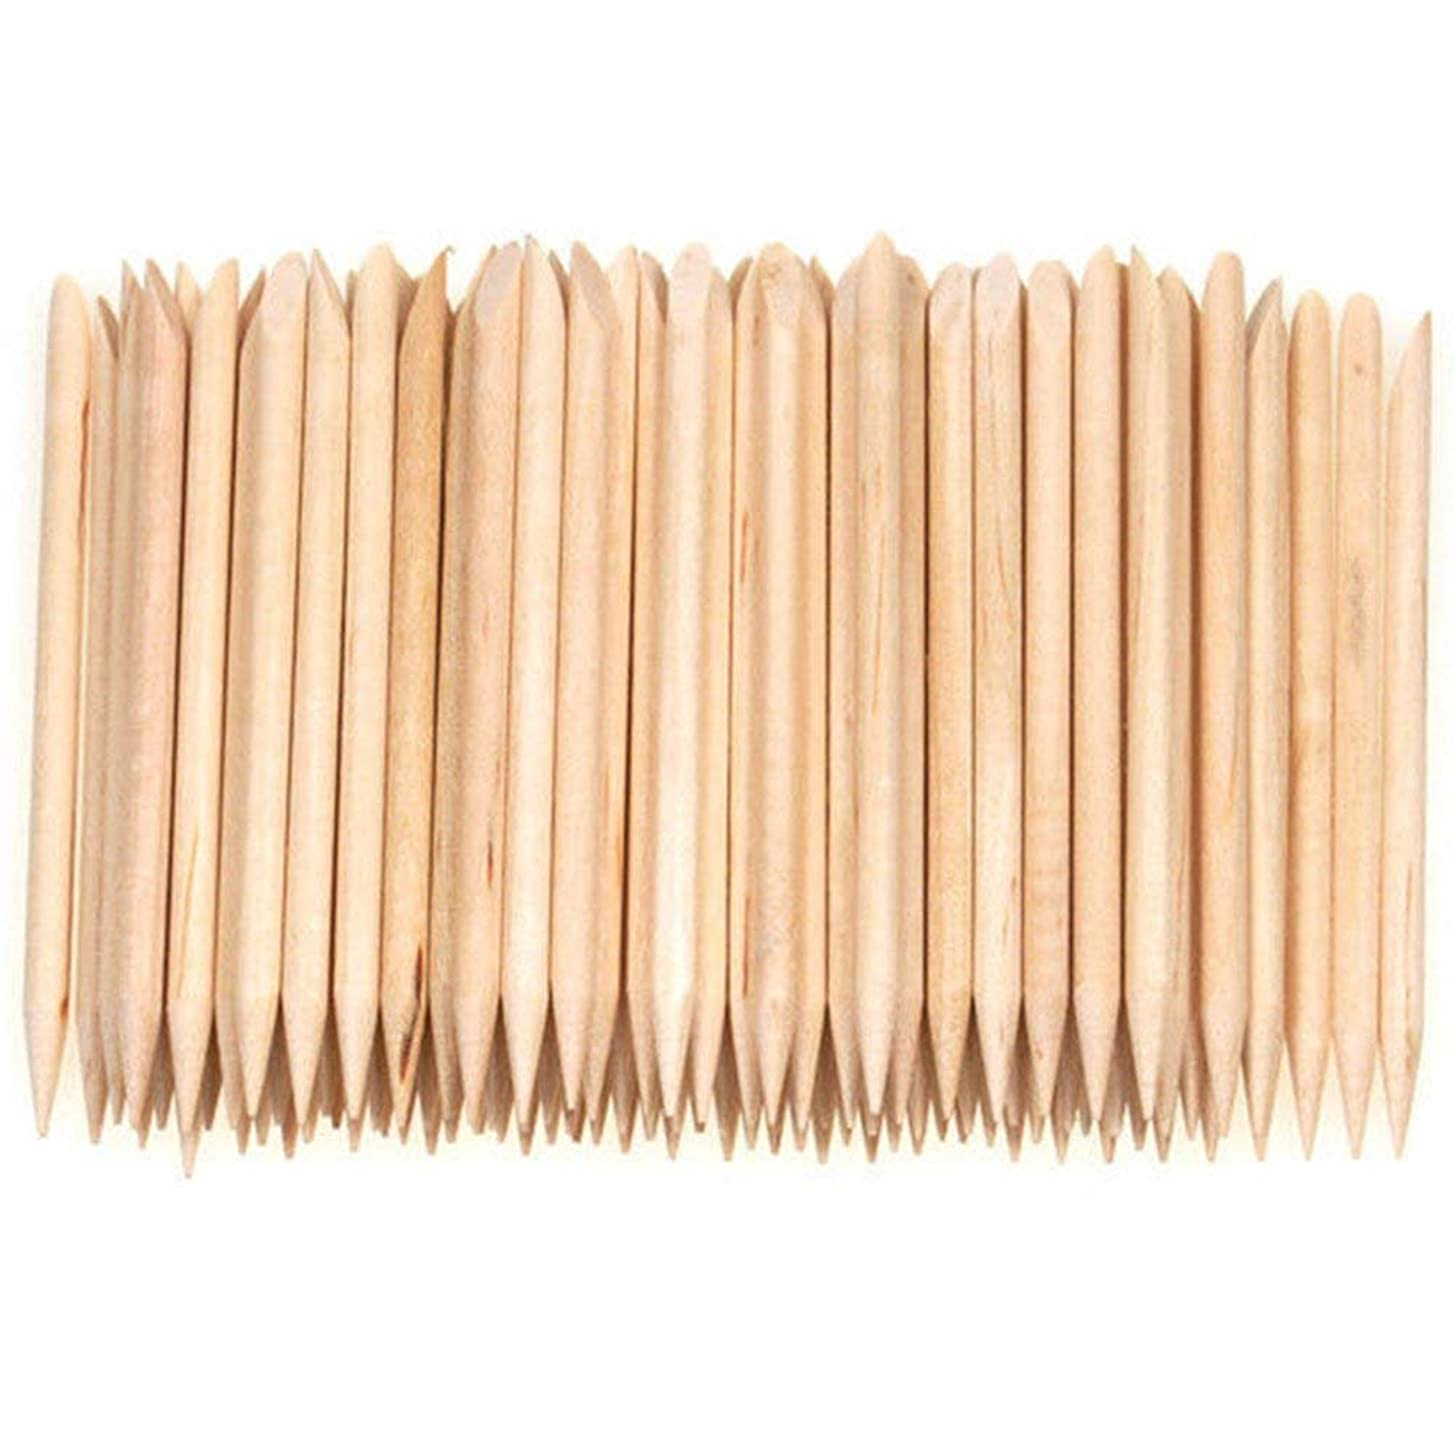 ACAMPTAR 100個ネイルアートデザイン木製の棒キューティクルプッシャーリムーバーマニキュアケア